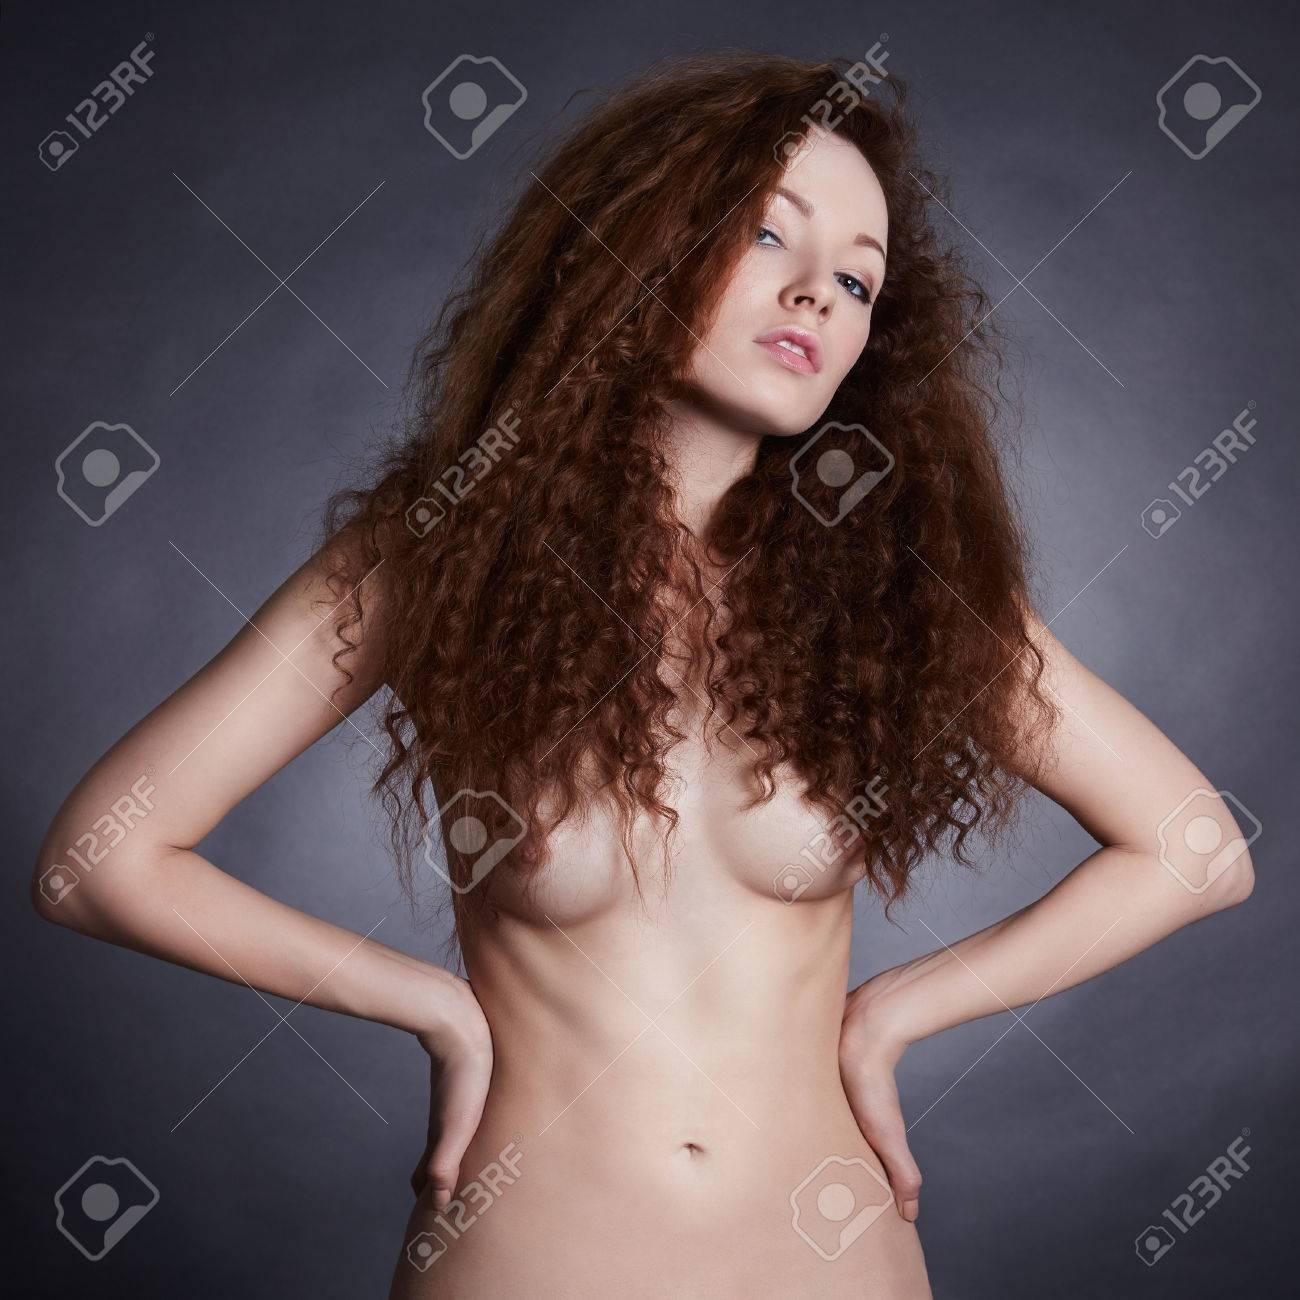 lisa simpson porn game